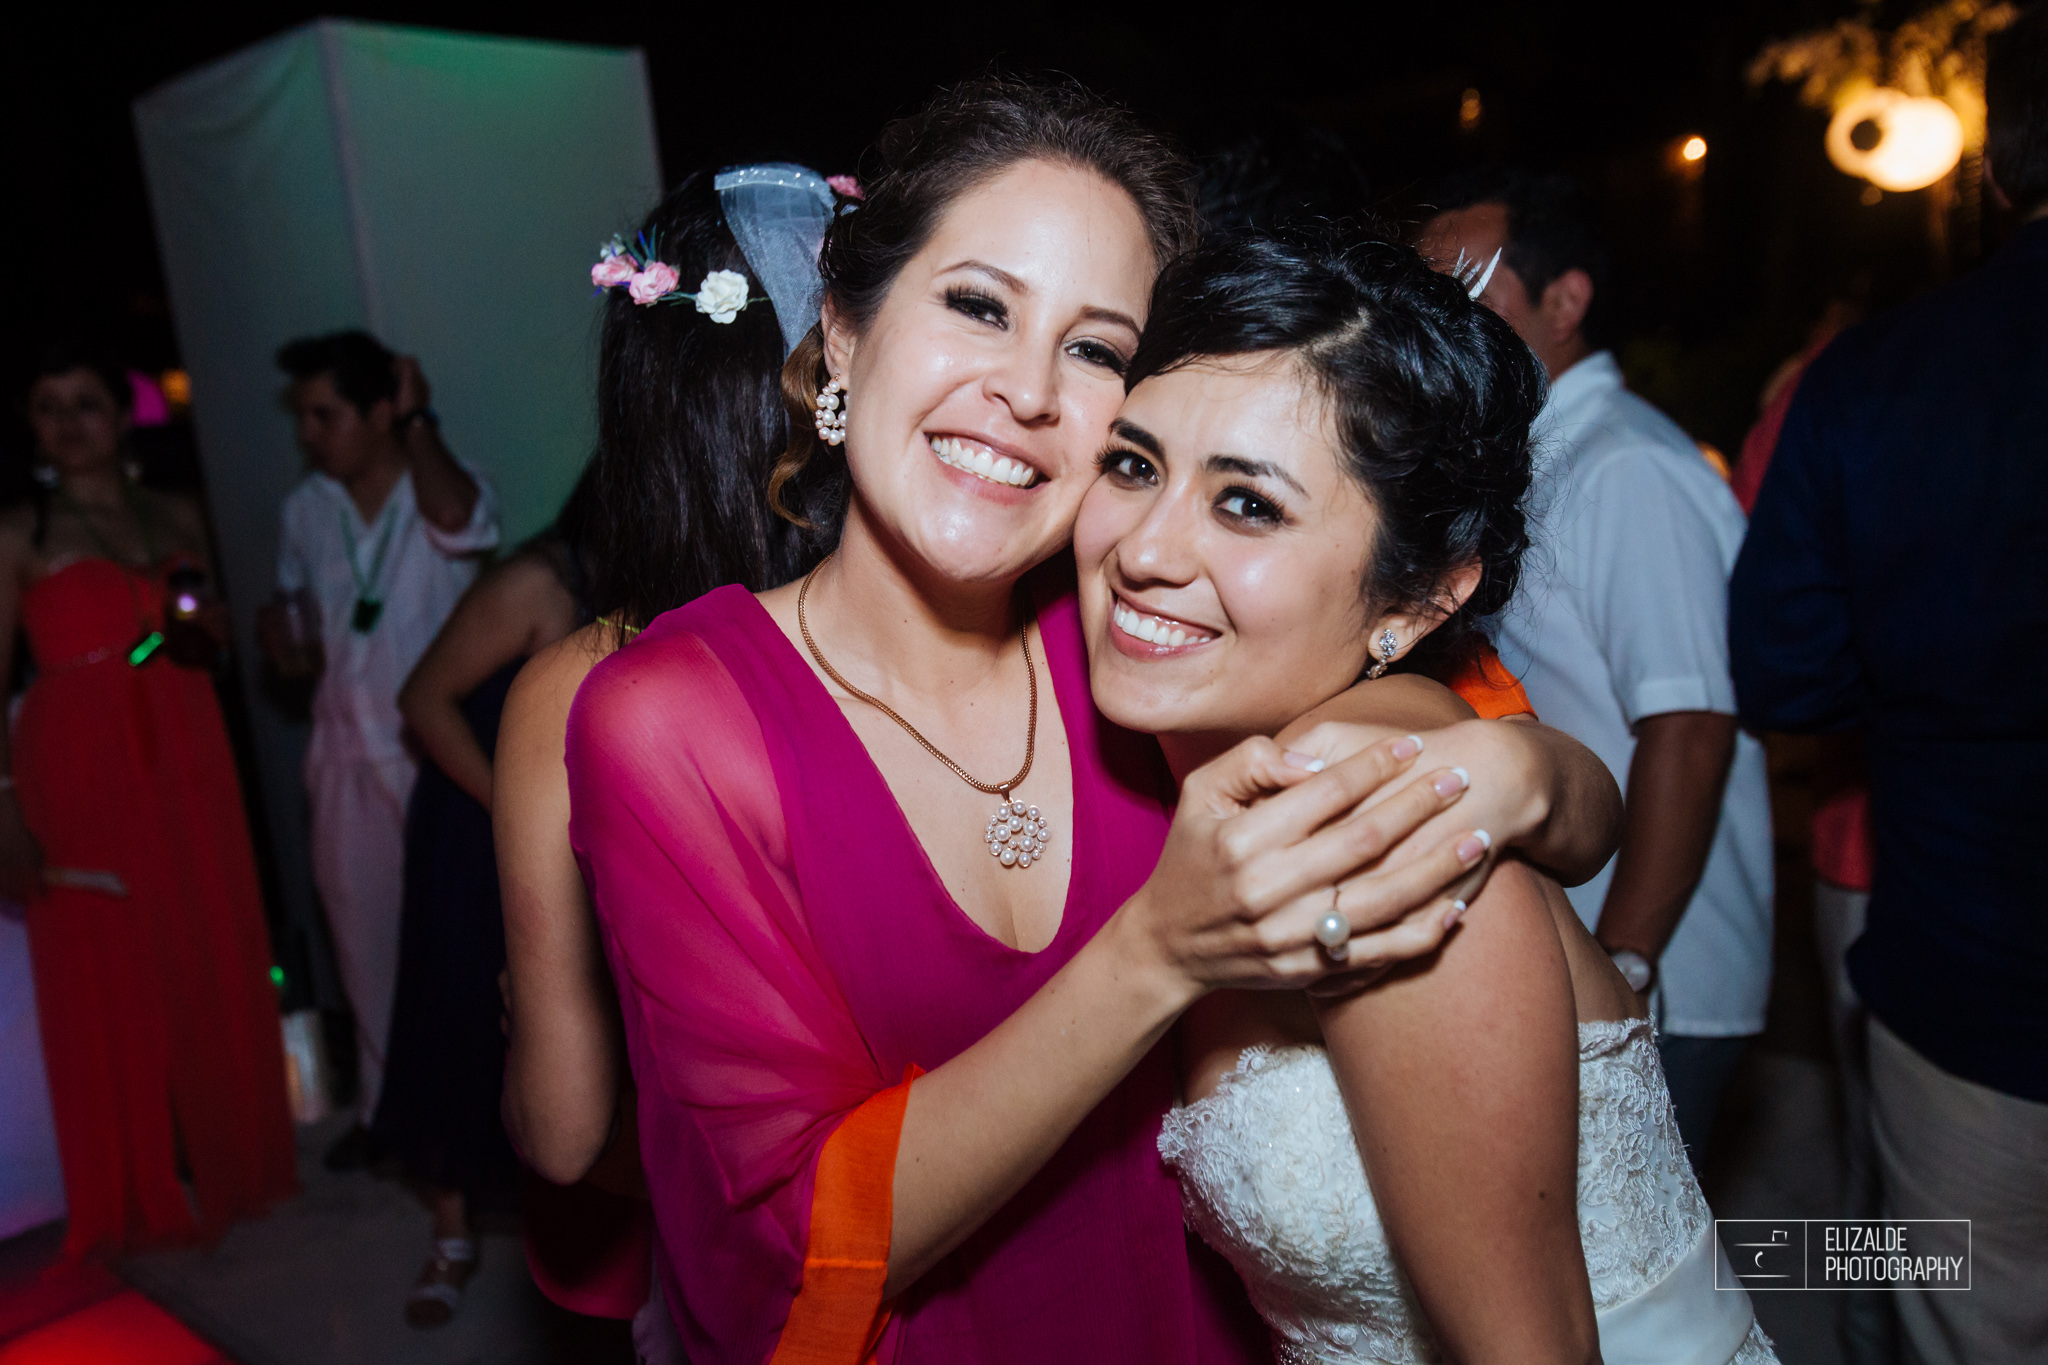 Pay and Ferran_Acapulco_Destination Wedding_Elizalde Photography-189.jpg